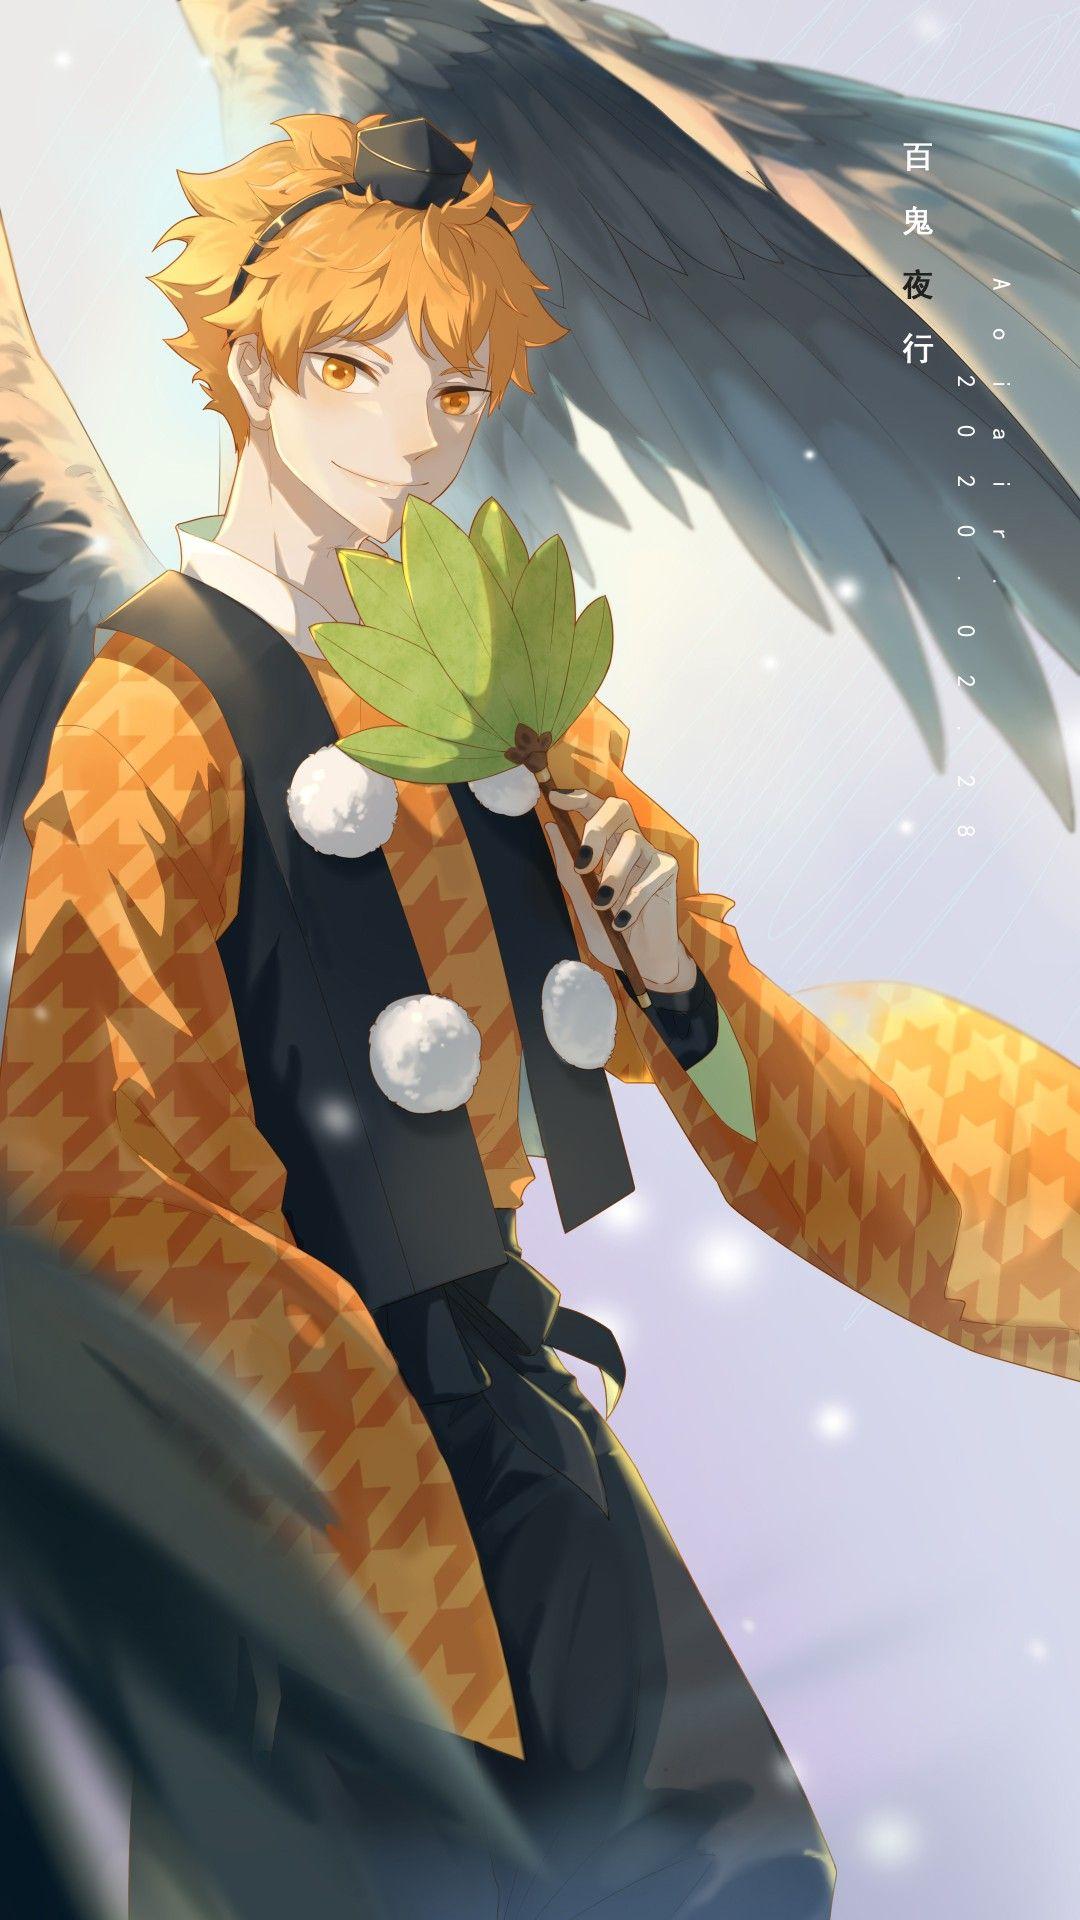 Pin By Furudate Hey Hey Hey On Haikyuu Haikyuu Anime Anime Cat Boy Haikyuu Fanart Anime boy ego wallpaper